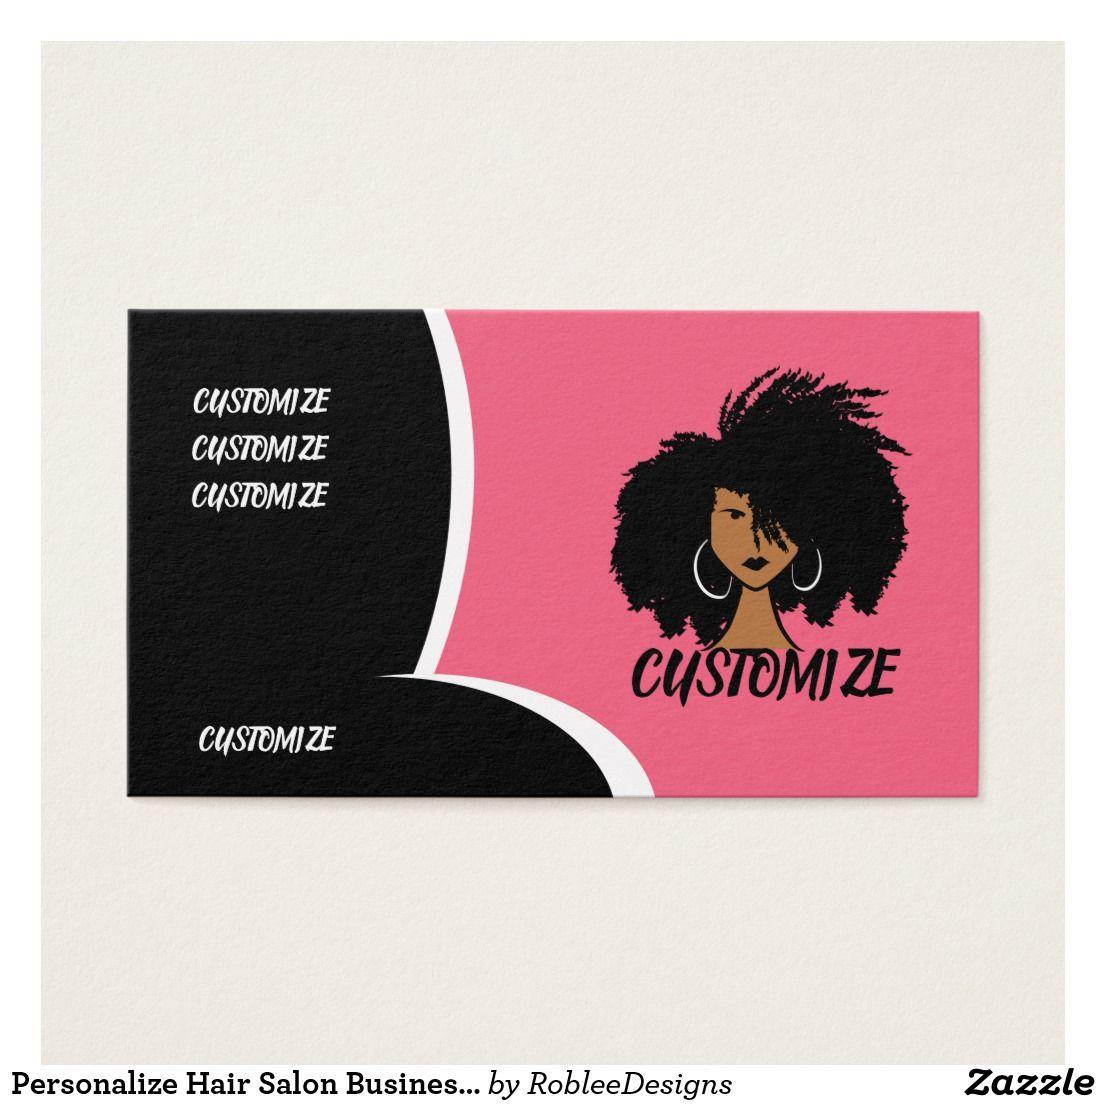 Personalize Hair Salon Business Card Zazzle Com In 2020 Salon Business Cards Hair Salon Business Business Cards Hair Salon